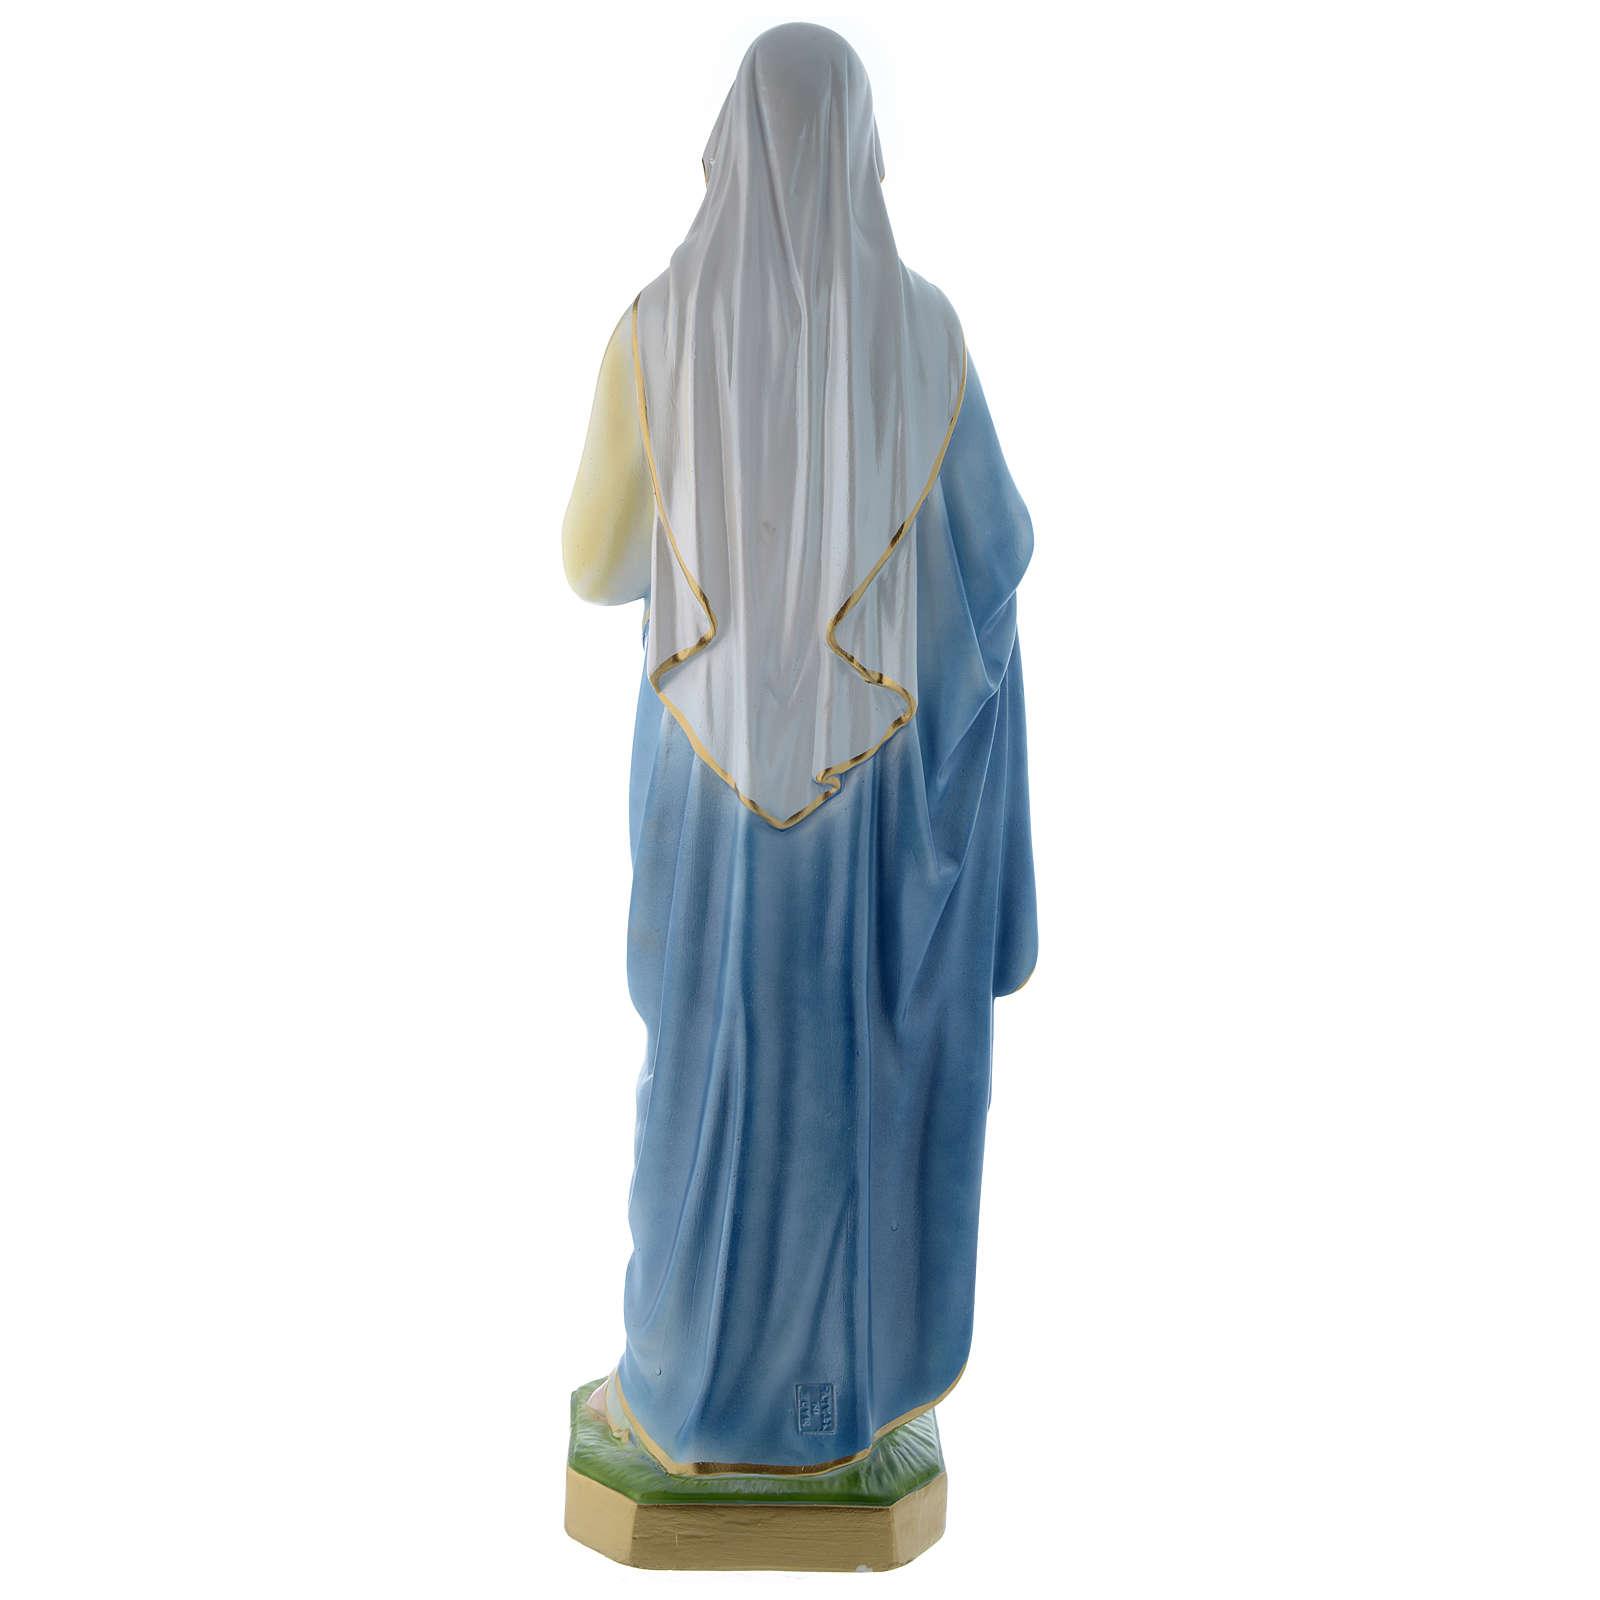 Statua Sacro Cuore di Maria 60 cm gesso madreperlaceo 4